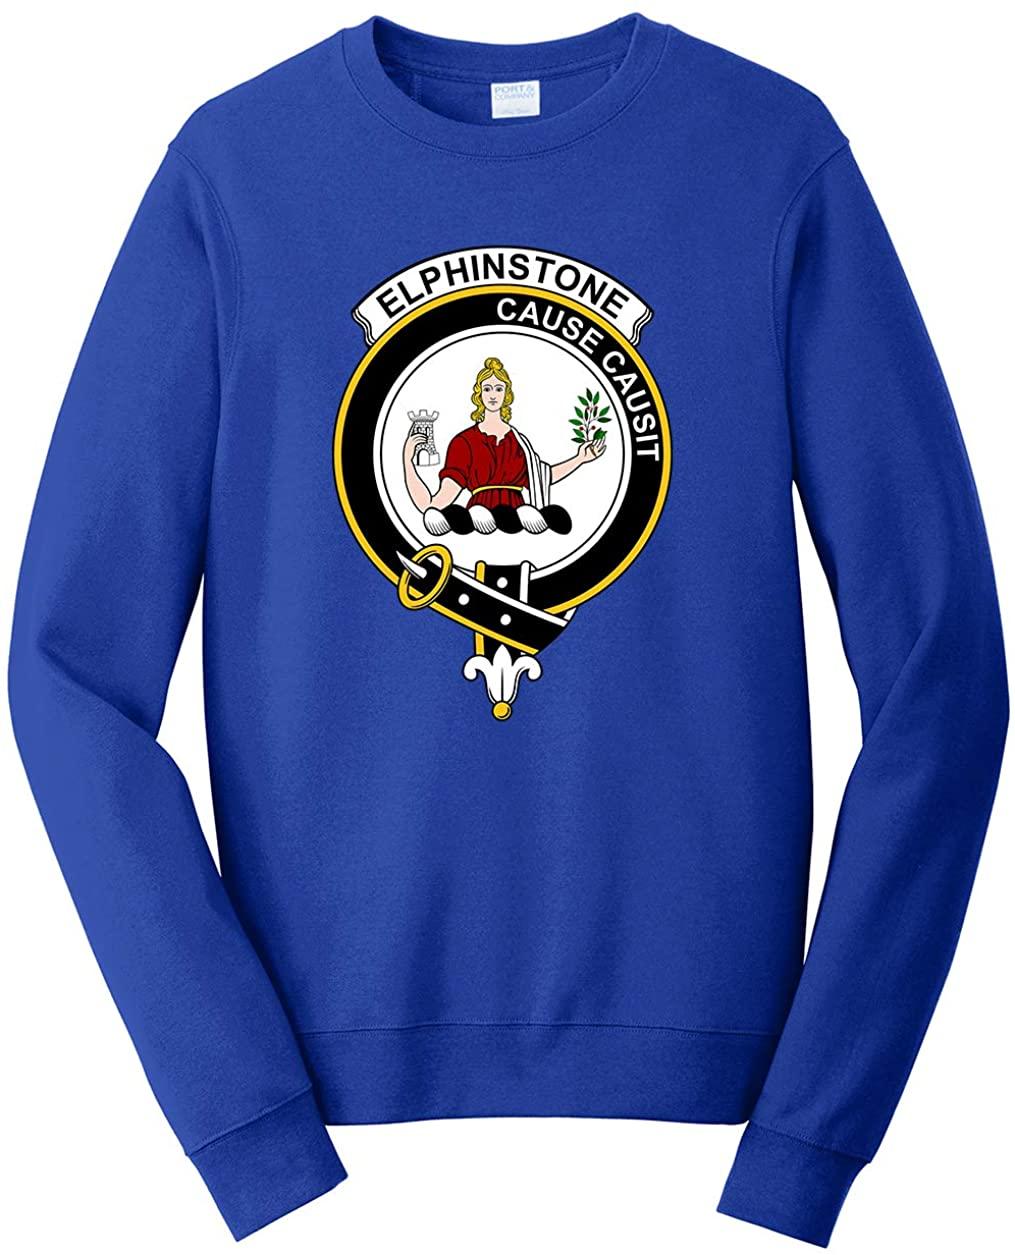 Tenacitee Unisex Scottish Clan Crest Badge Elphinstone Sweatshirt